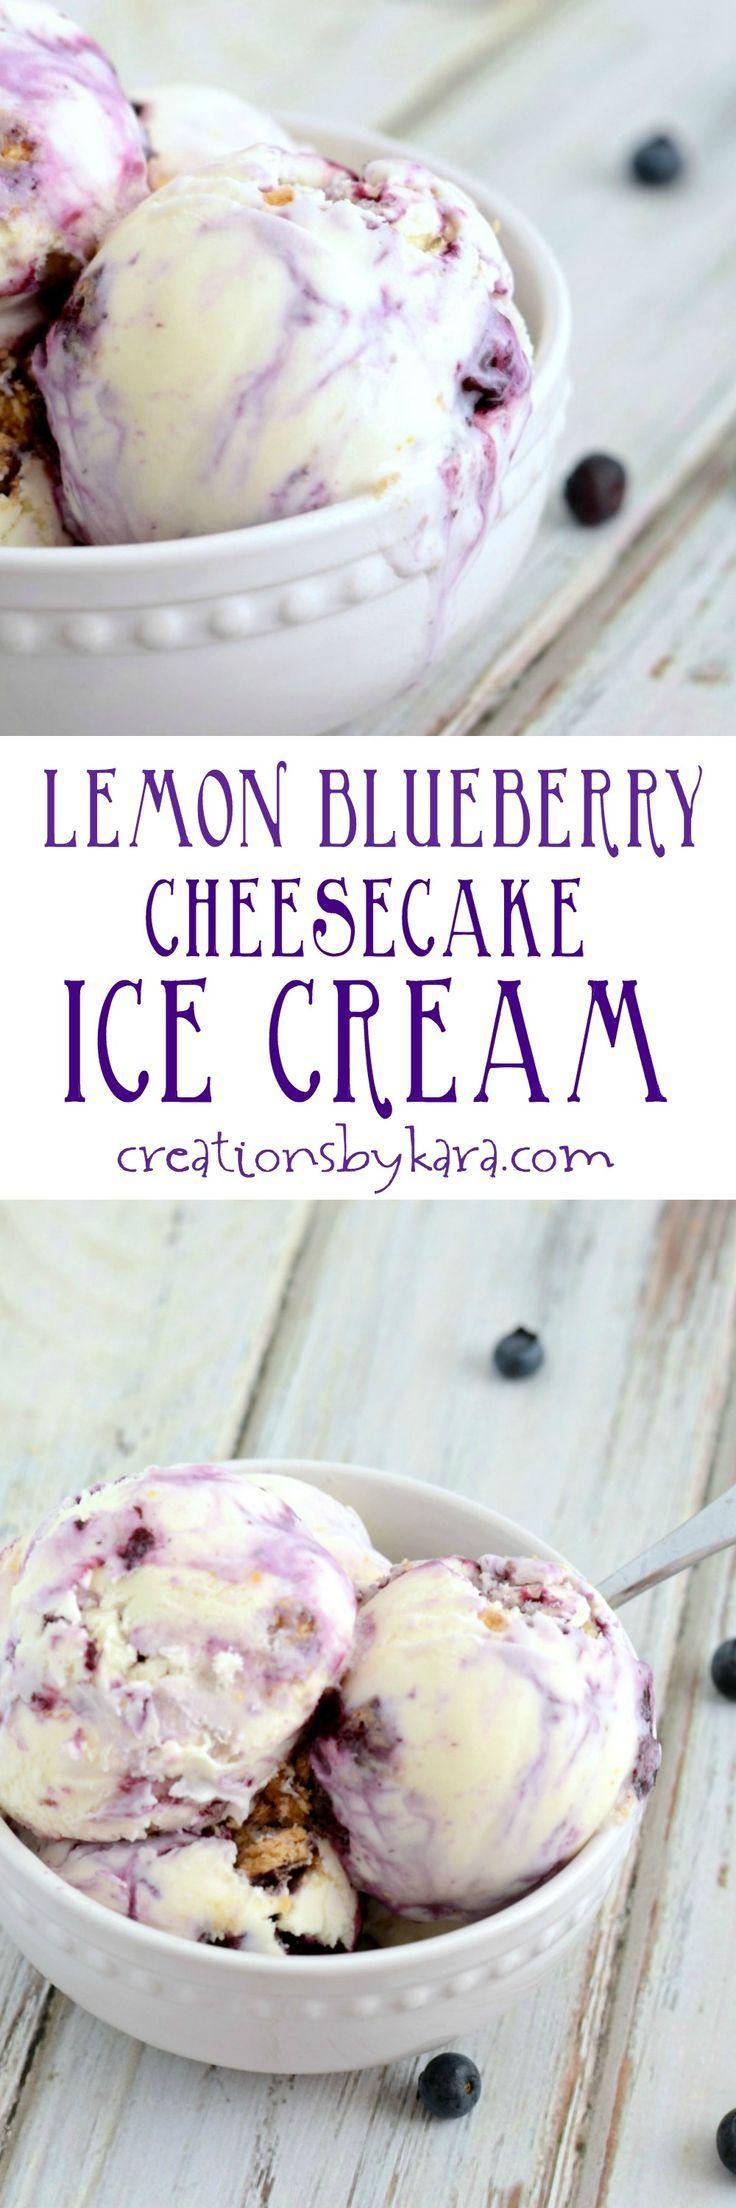 how to make ice cream drinks